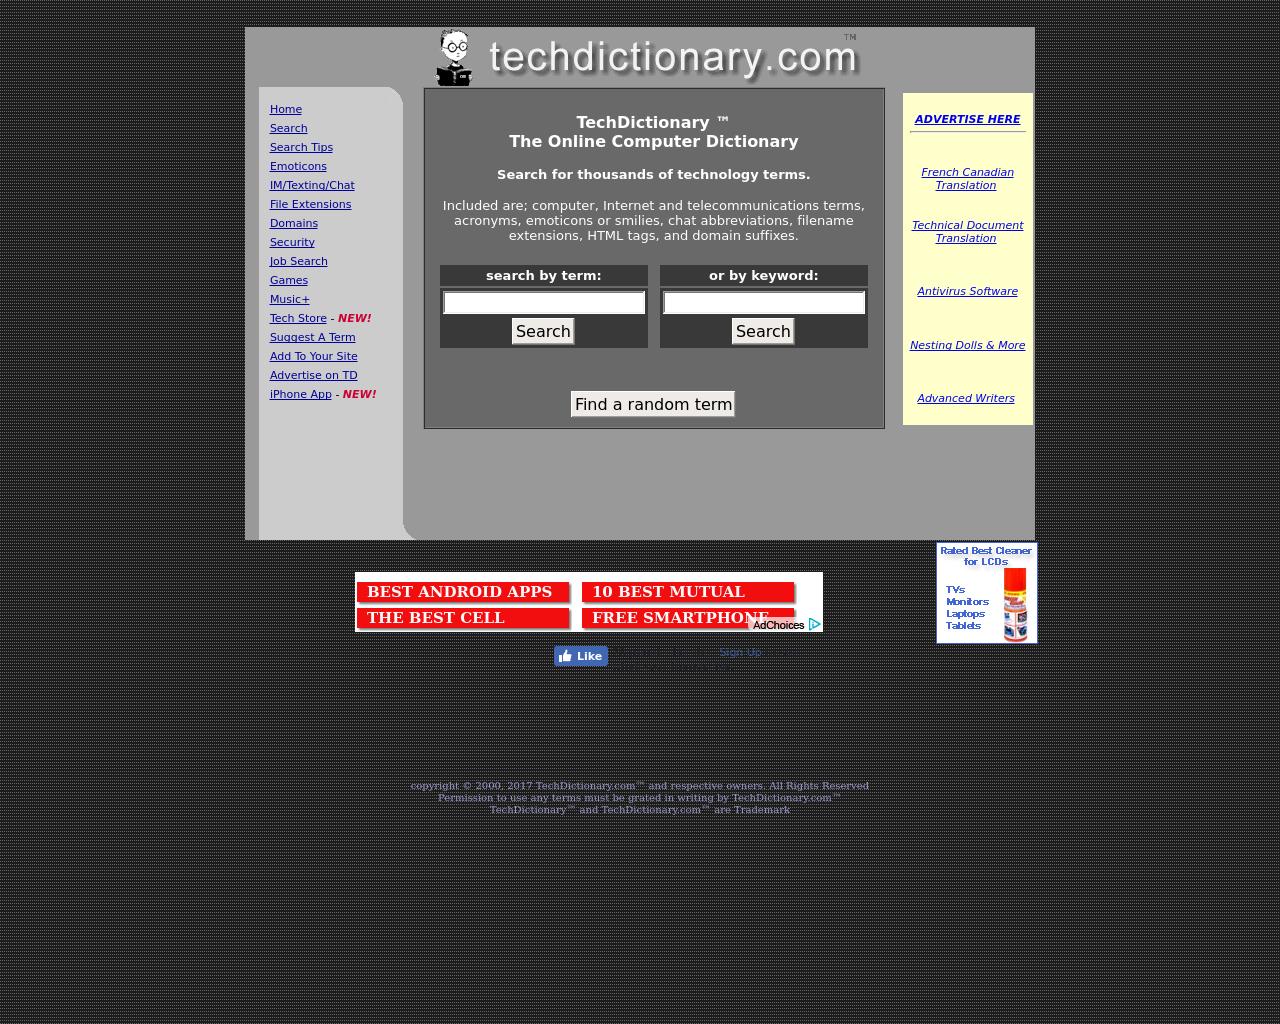 techdictionary.com-Advertising-Reviews-Pricing